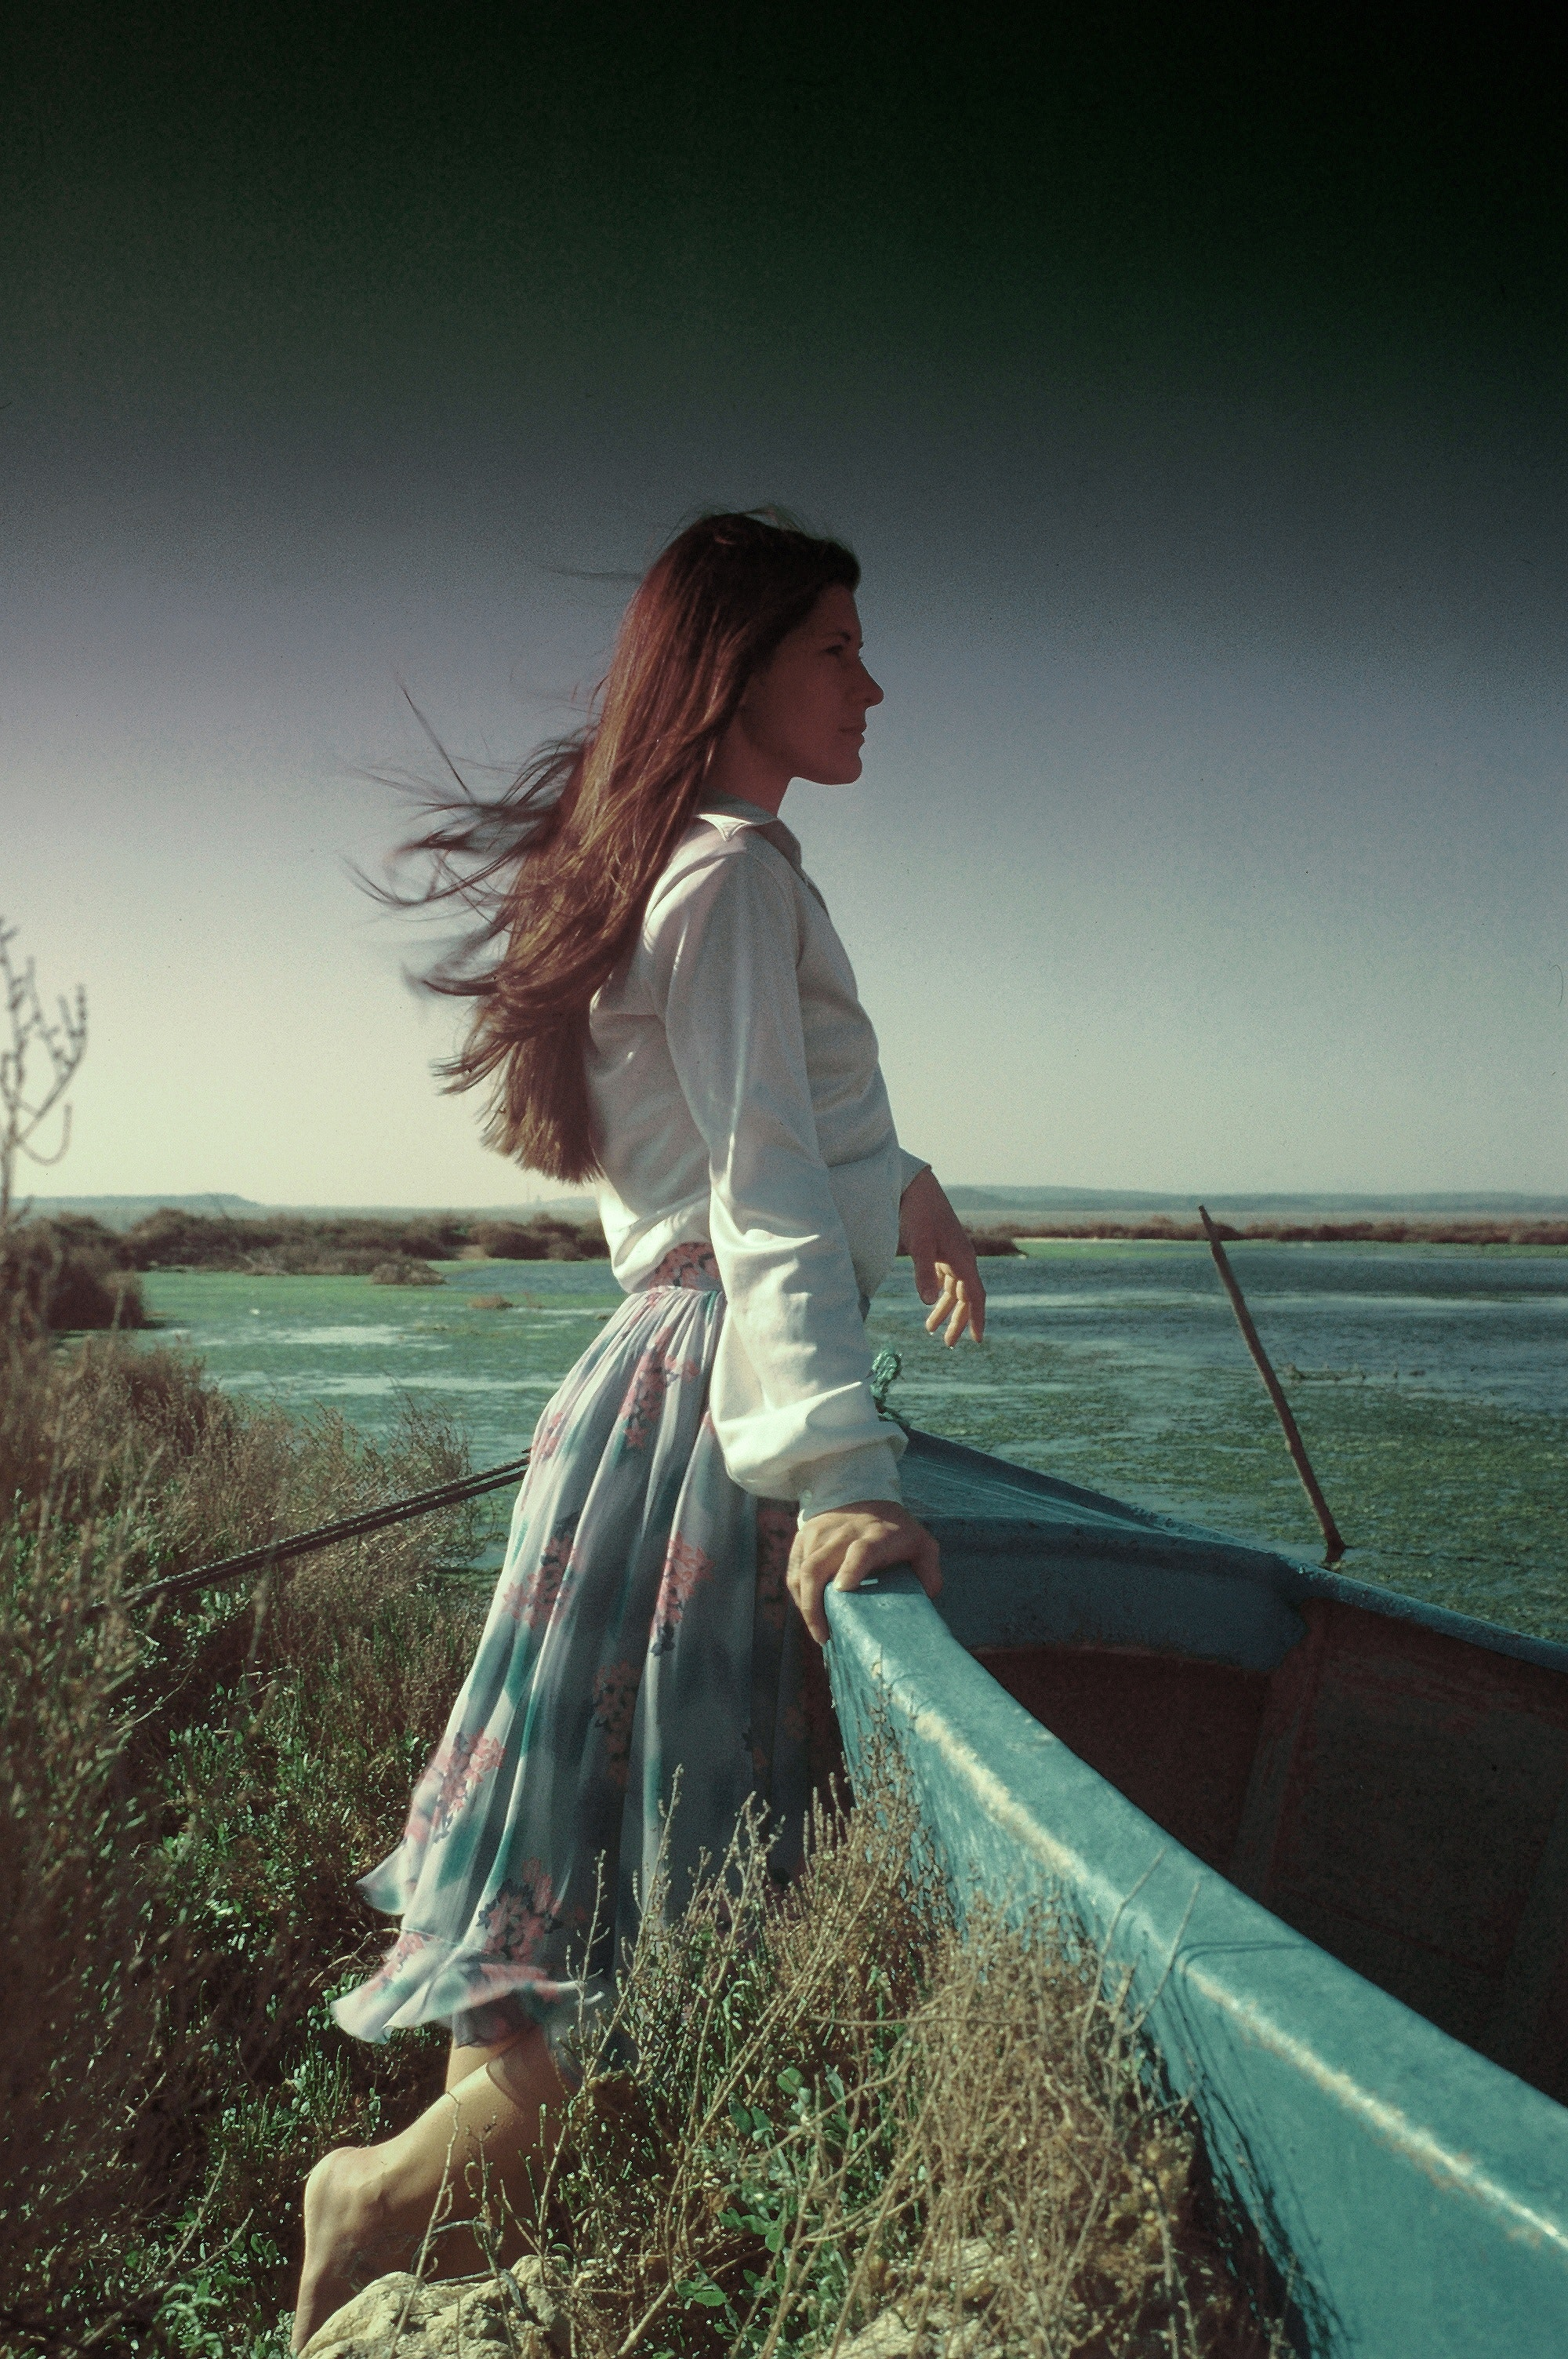 Woman looking photo